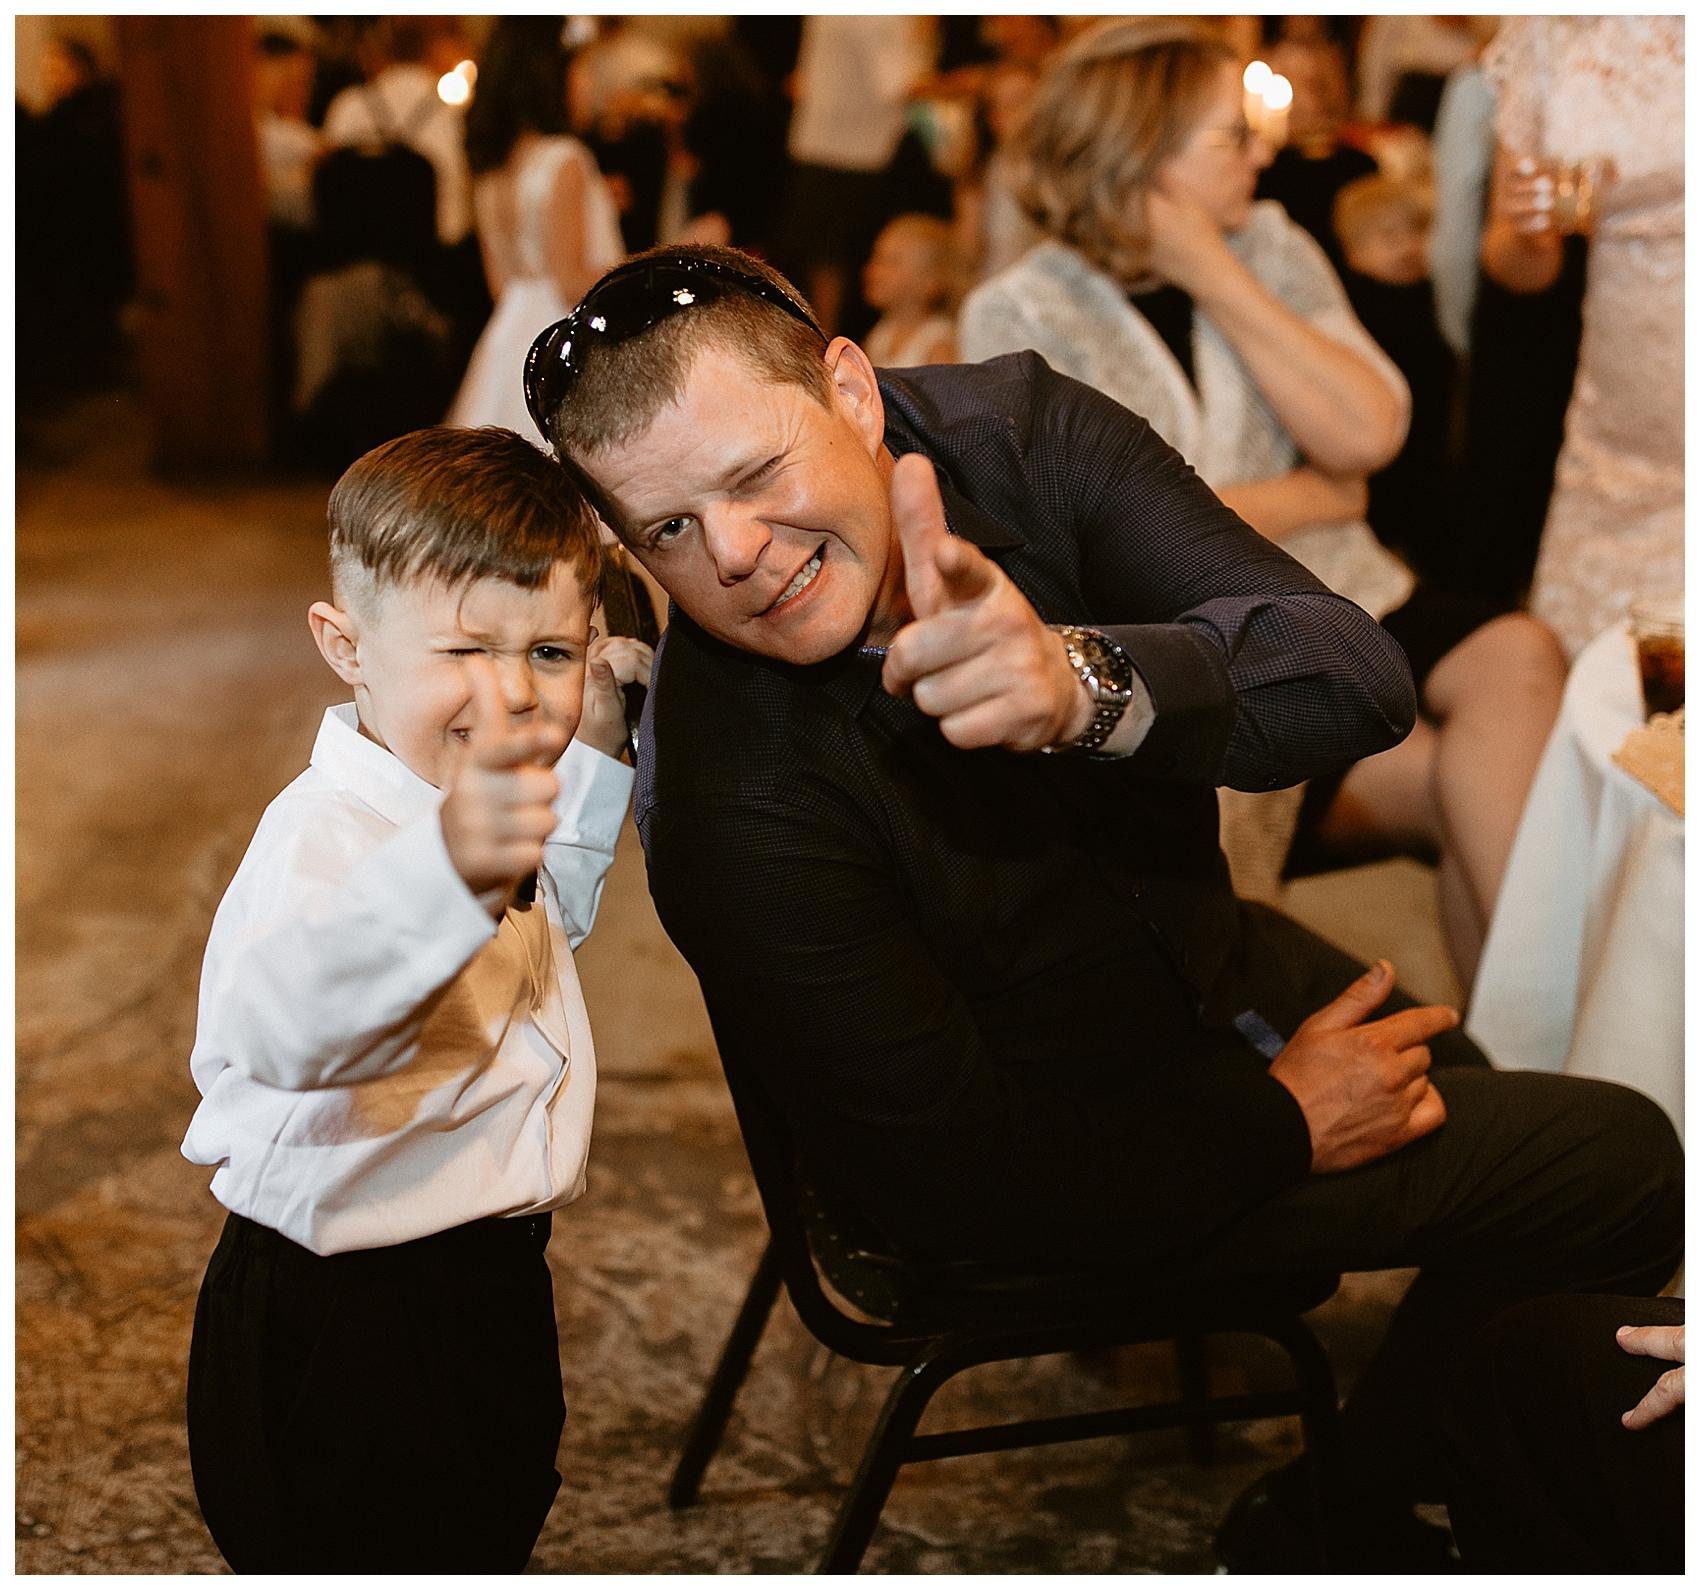 Chateau Rive Spokane Wedding Cassie Trottier Photography01102.jpg